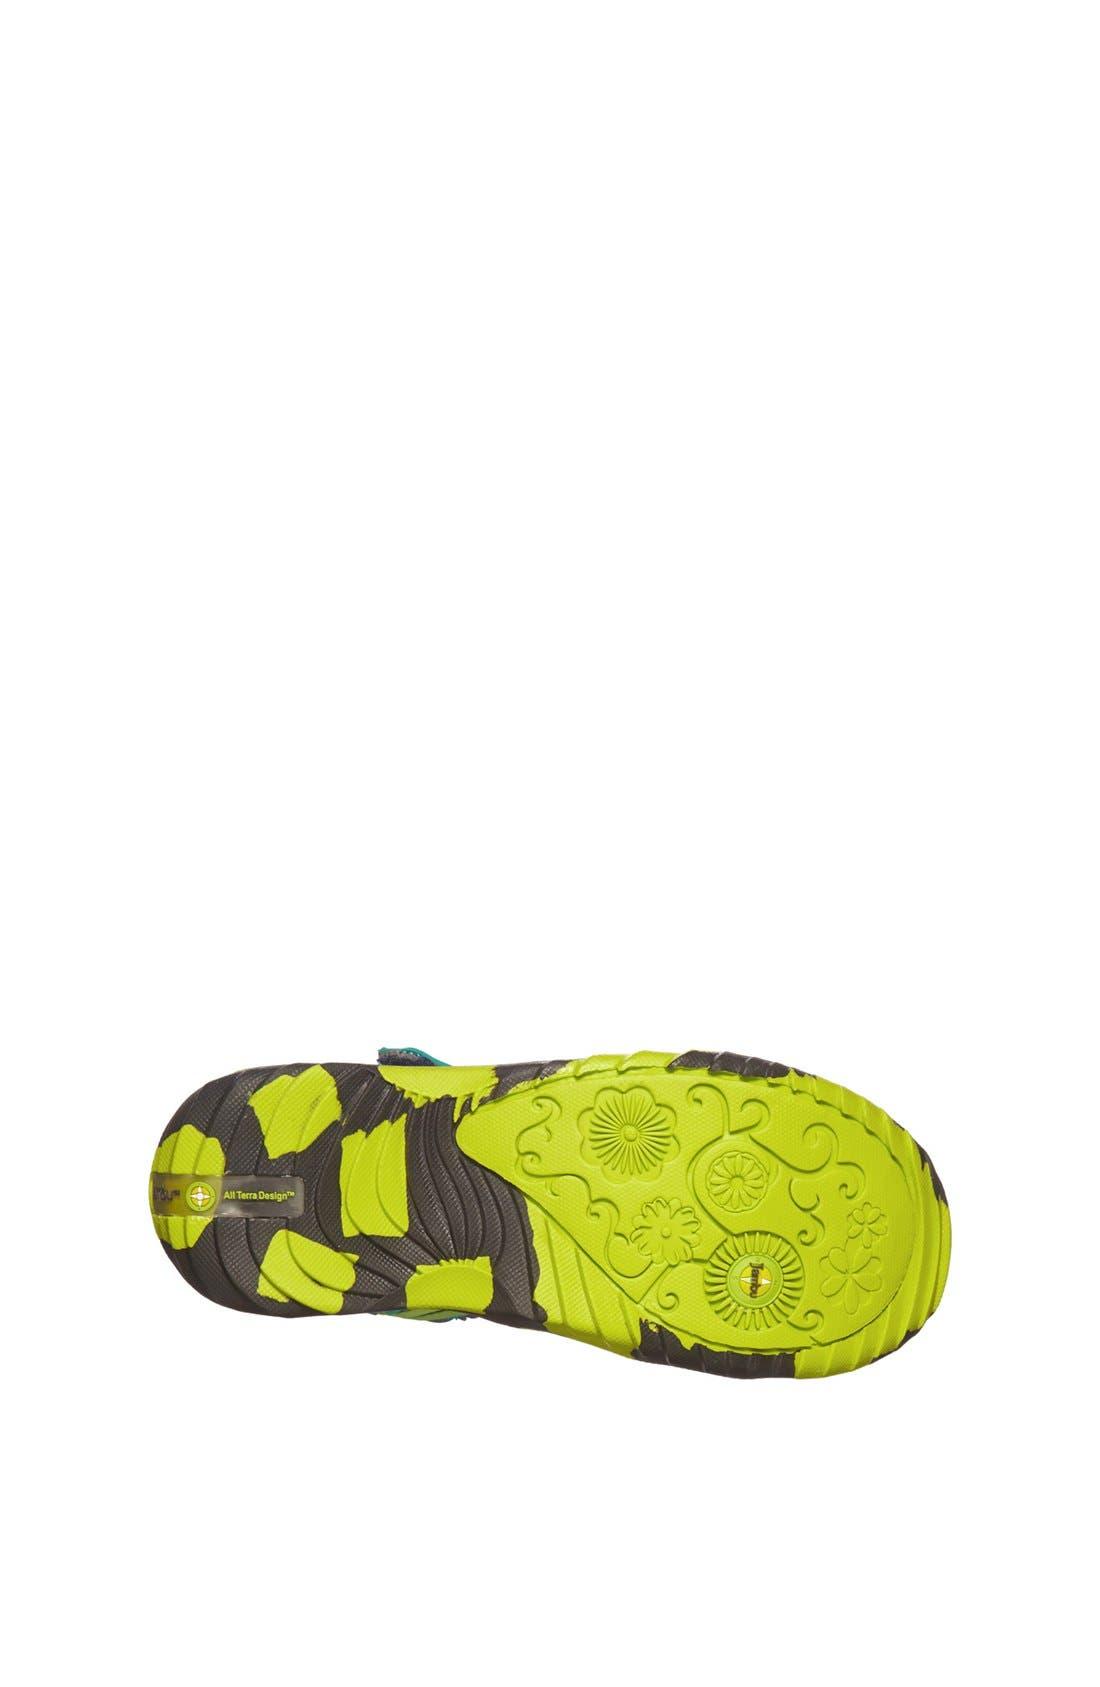 Alternate Image 4  - Jambu 'Dusk' Sandal (Toddler, Little Kid & Big Kid)